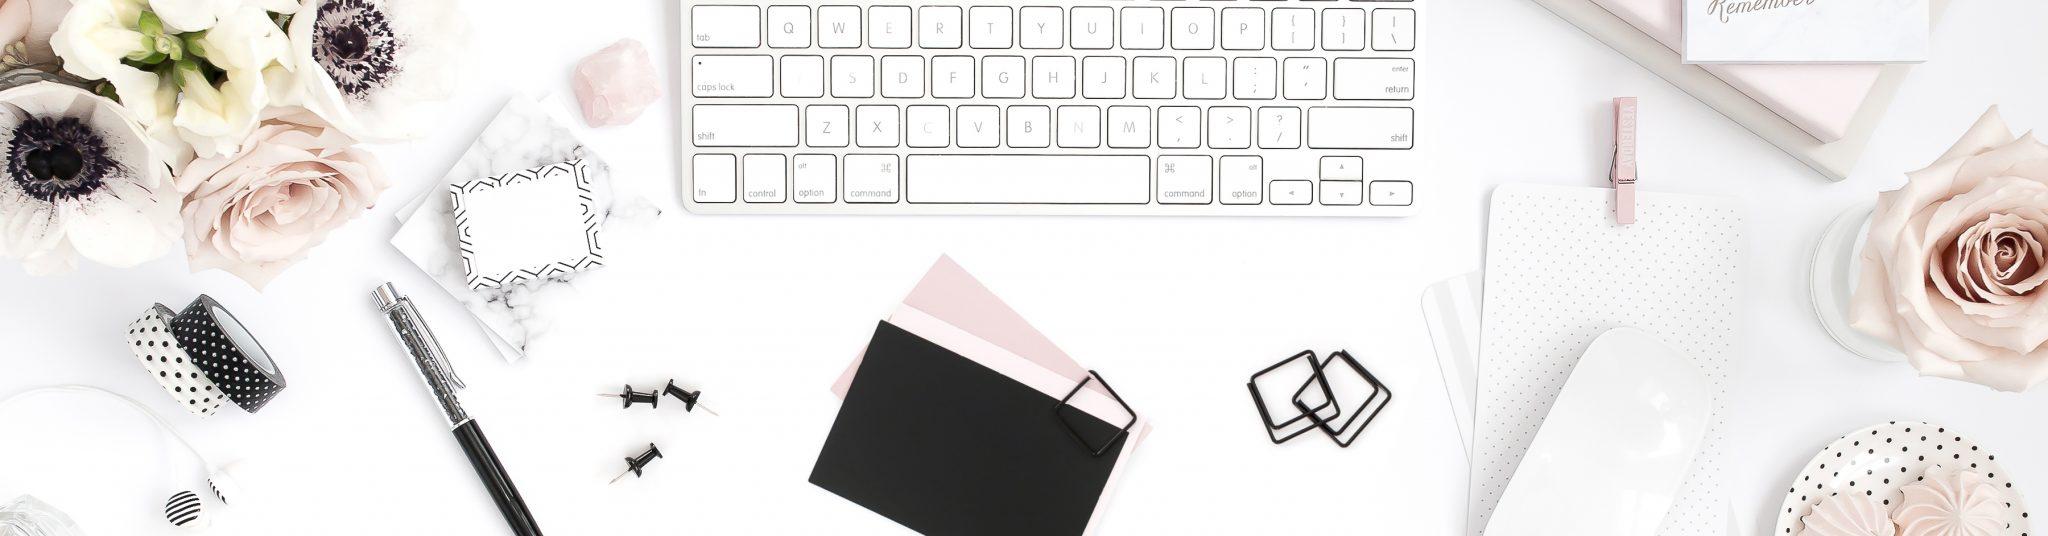 Eloquently Crafted Blog Website Header